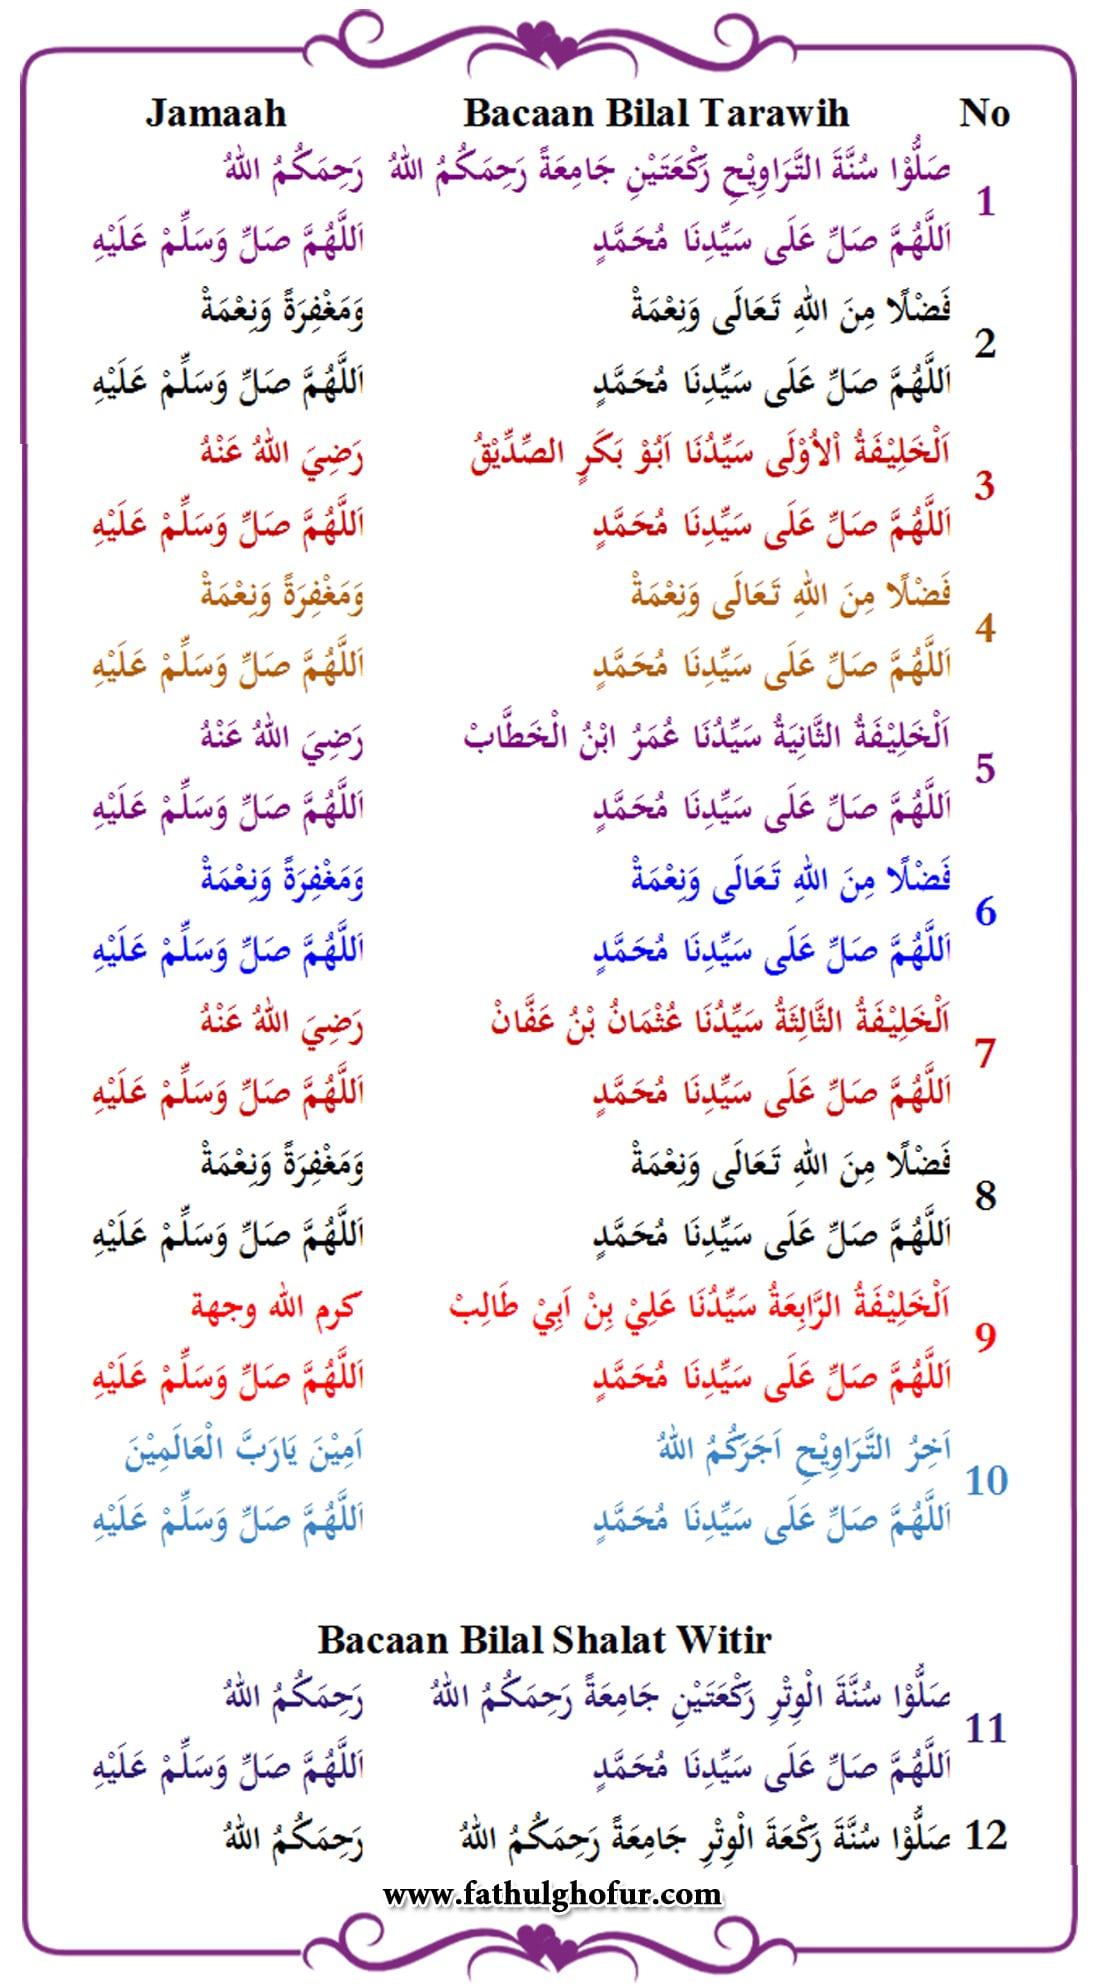 Bacaan-Bilal-dan-Jamaah-Sholat-Tarawih